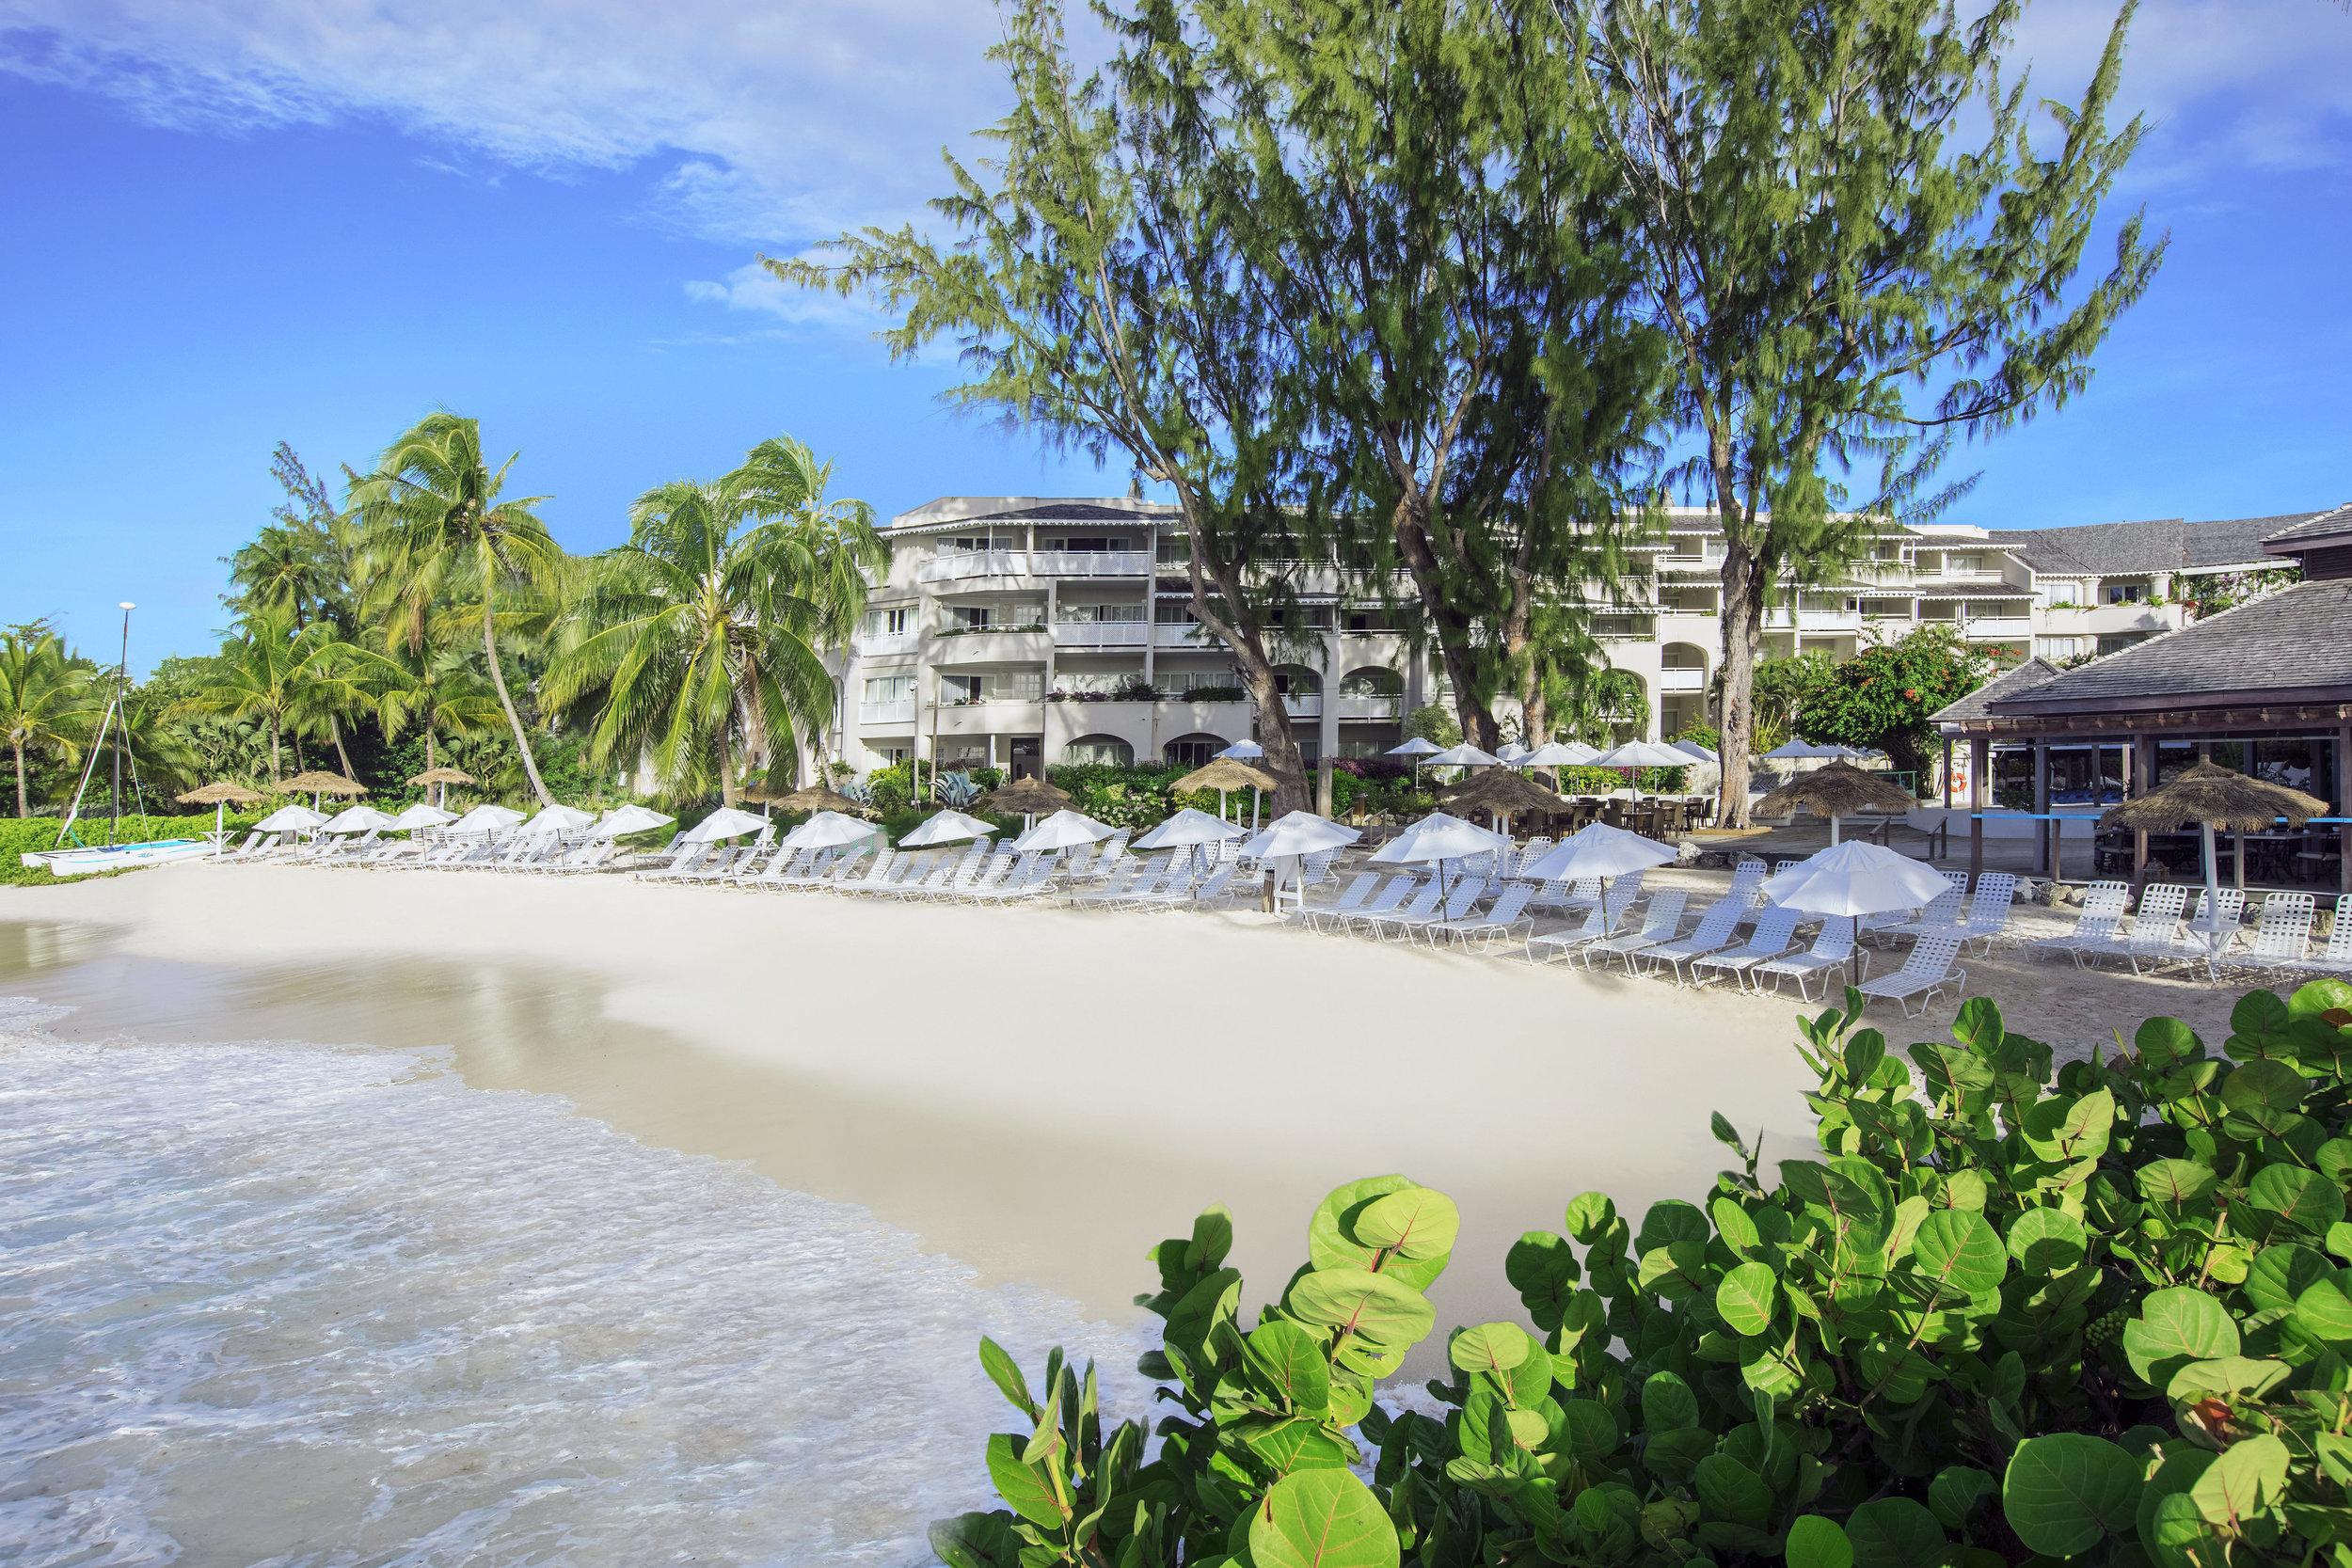 Bougainvillea - Beach - Hotel Front View.jpg